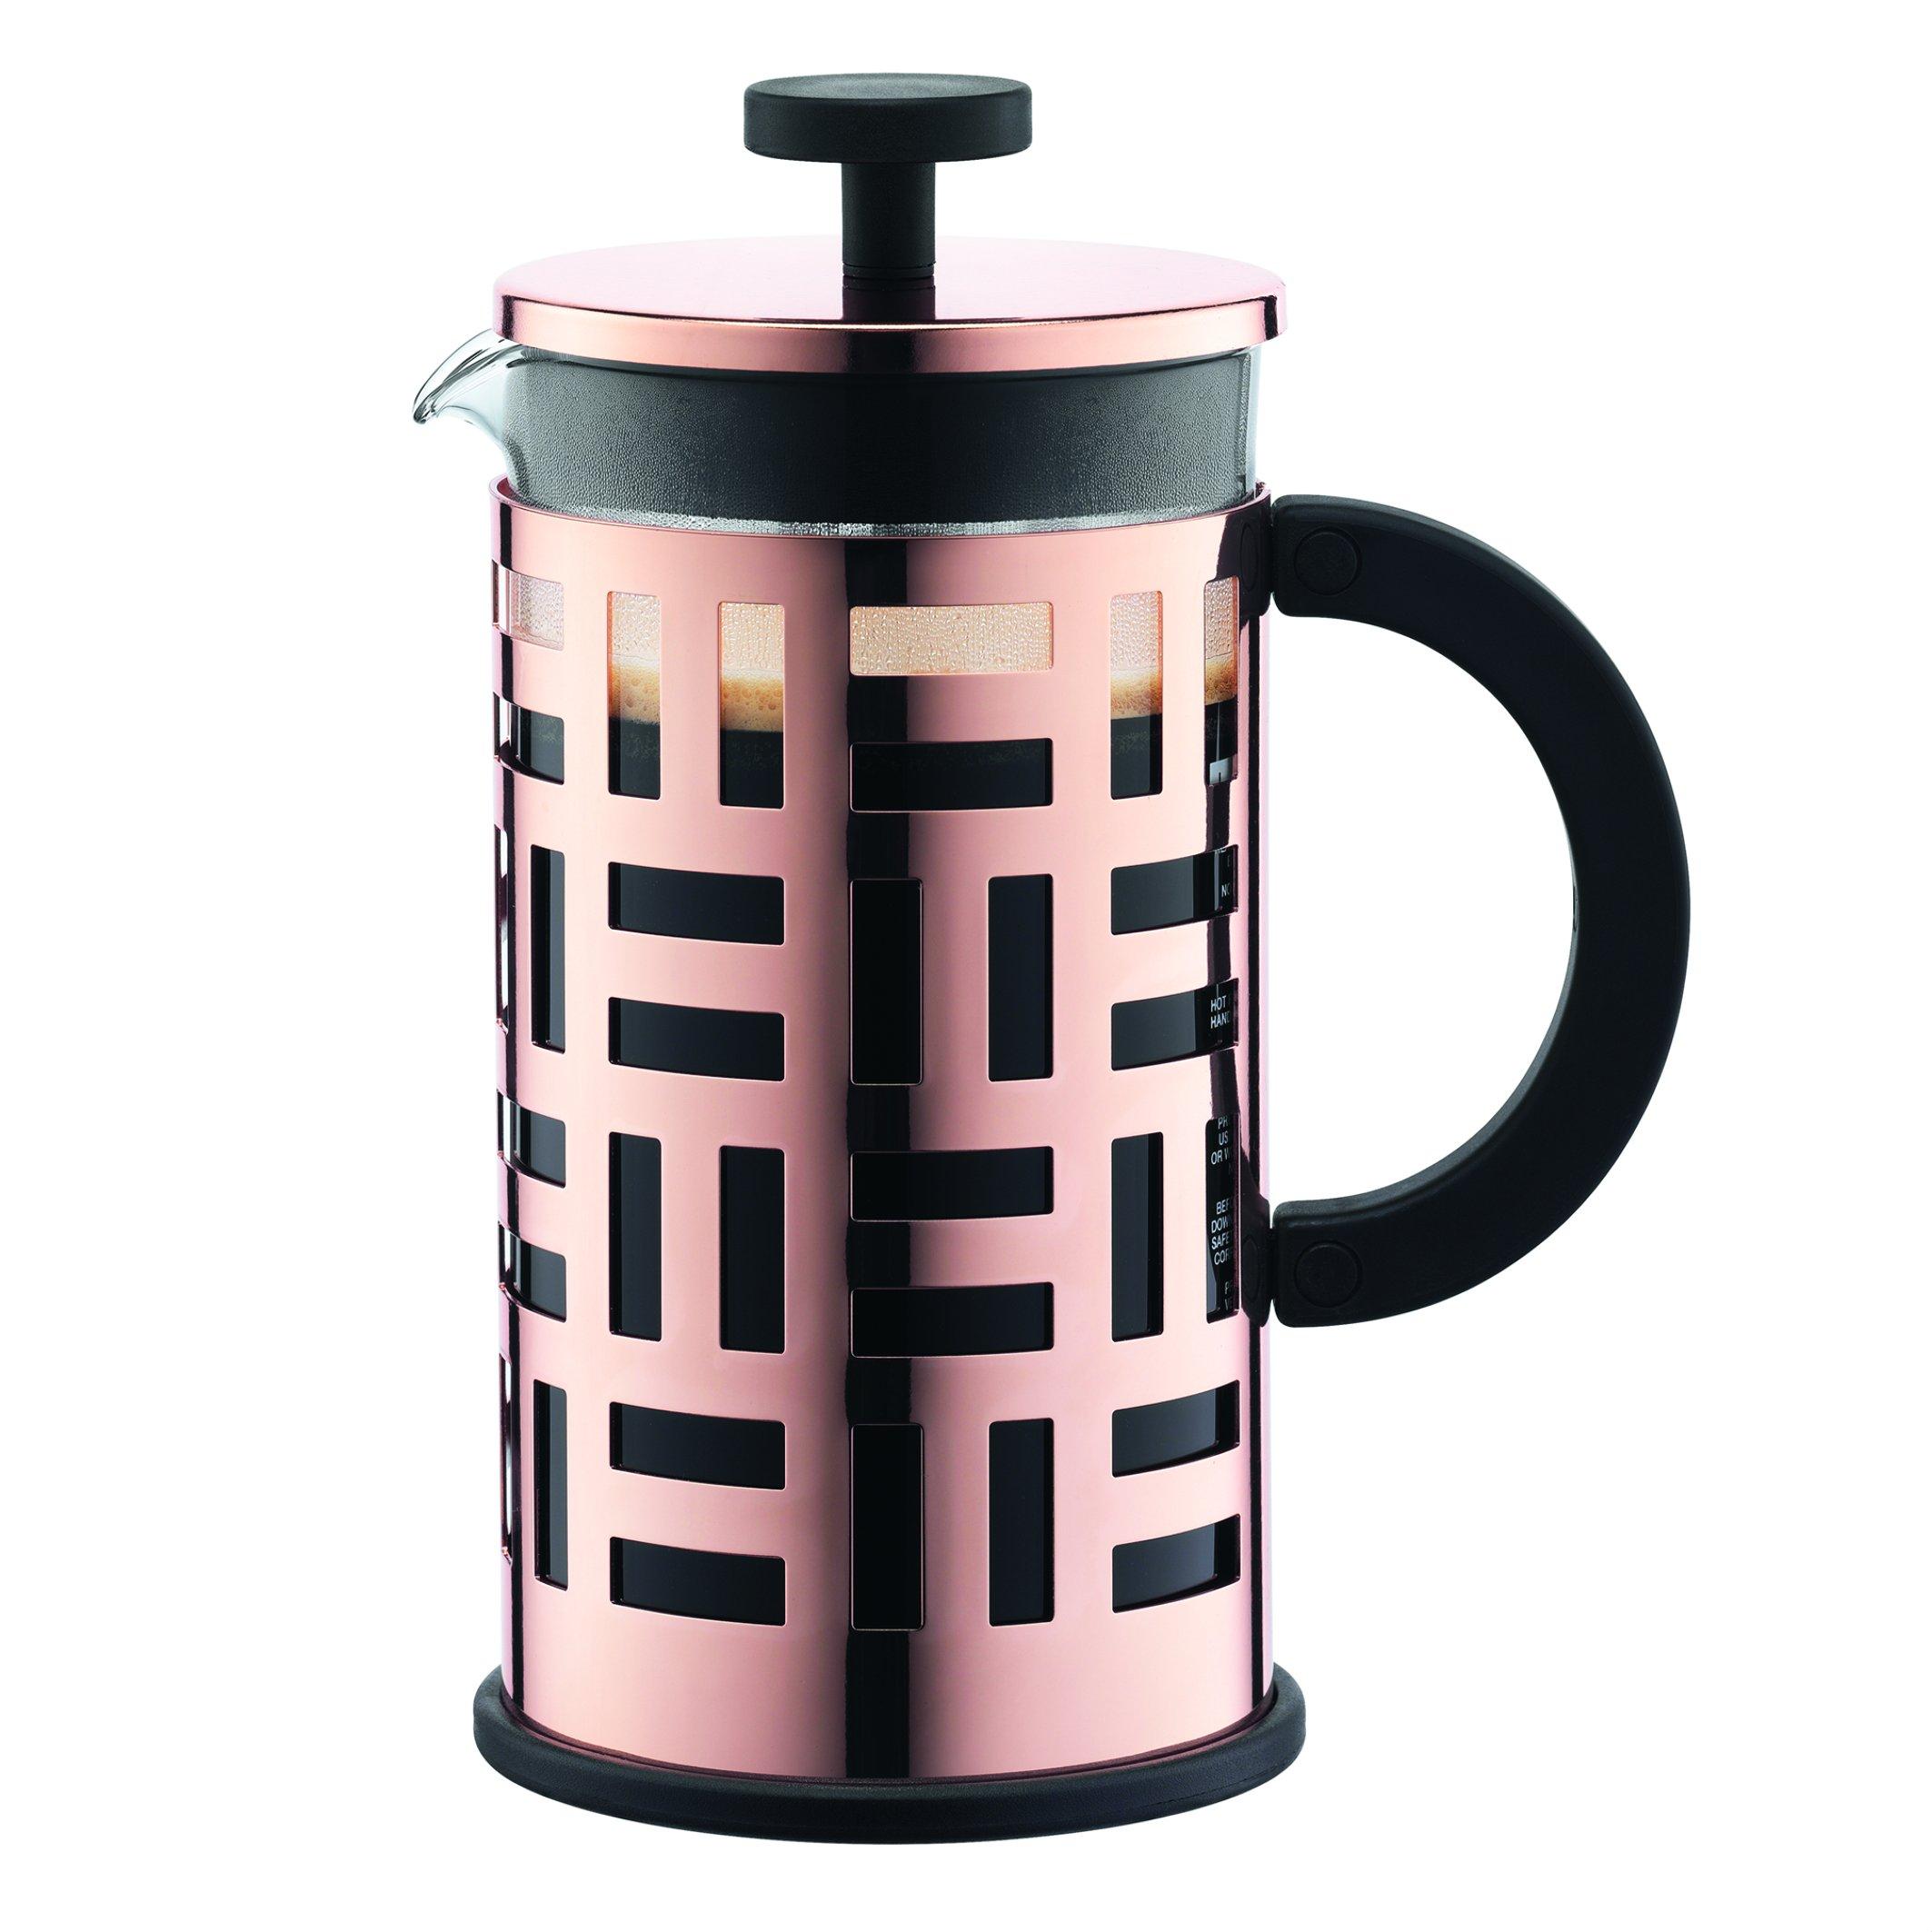 Bodum 8 Cup Eileen Coffee Maker, 34 oz, Copper